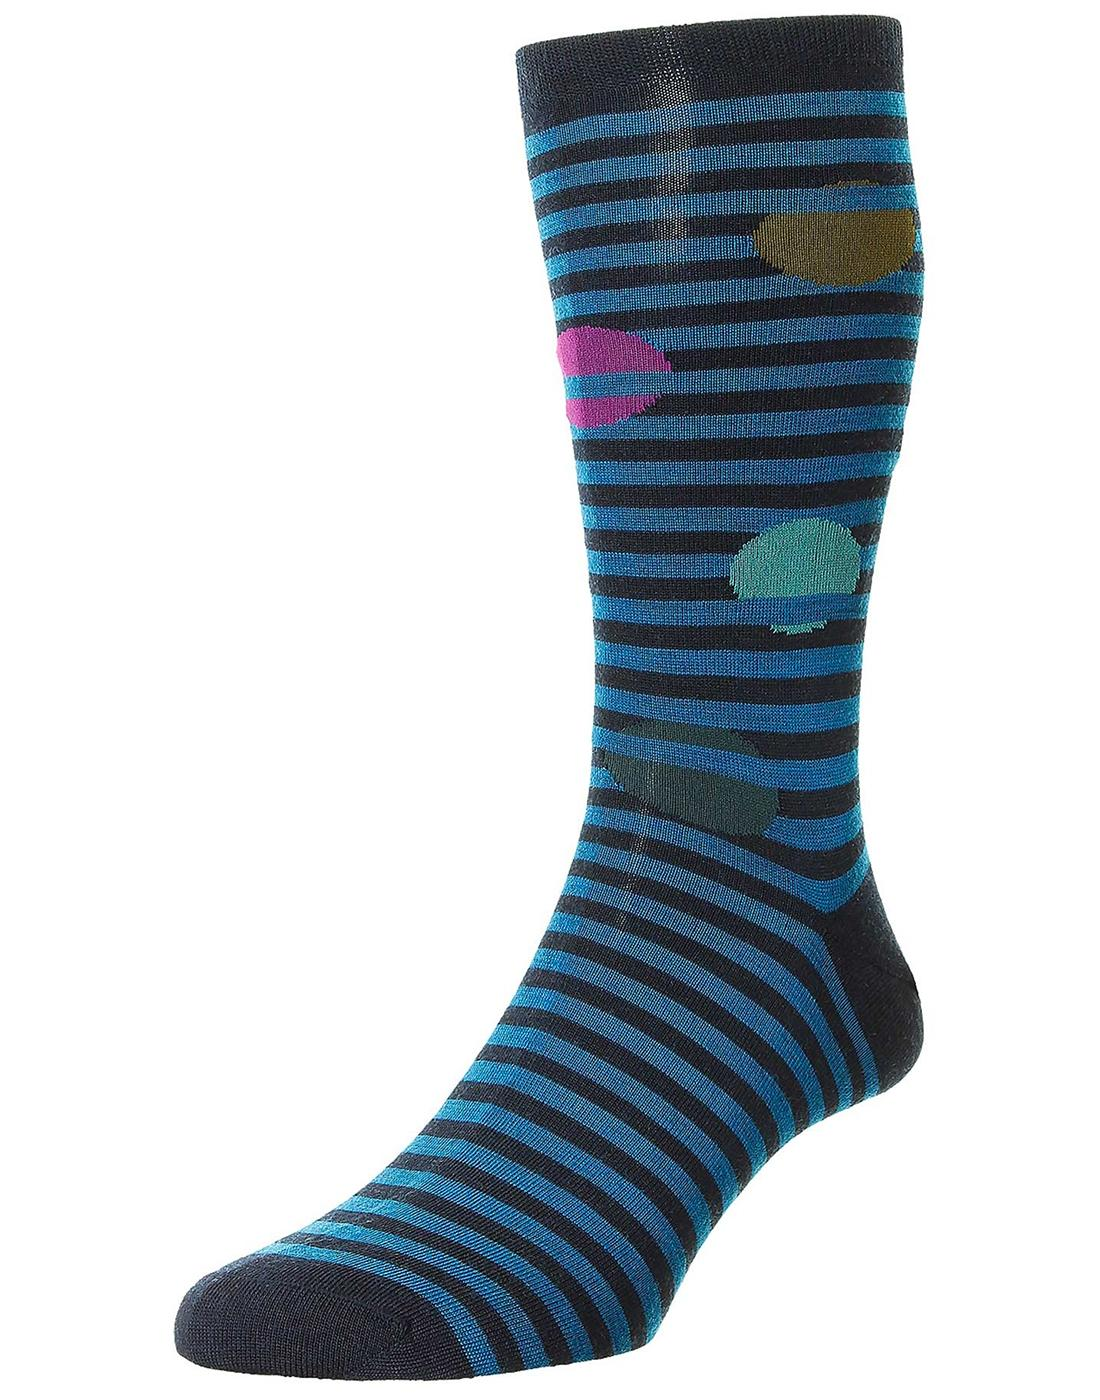 + Berner PANTHERELLA Retro Stripe Merino Socks